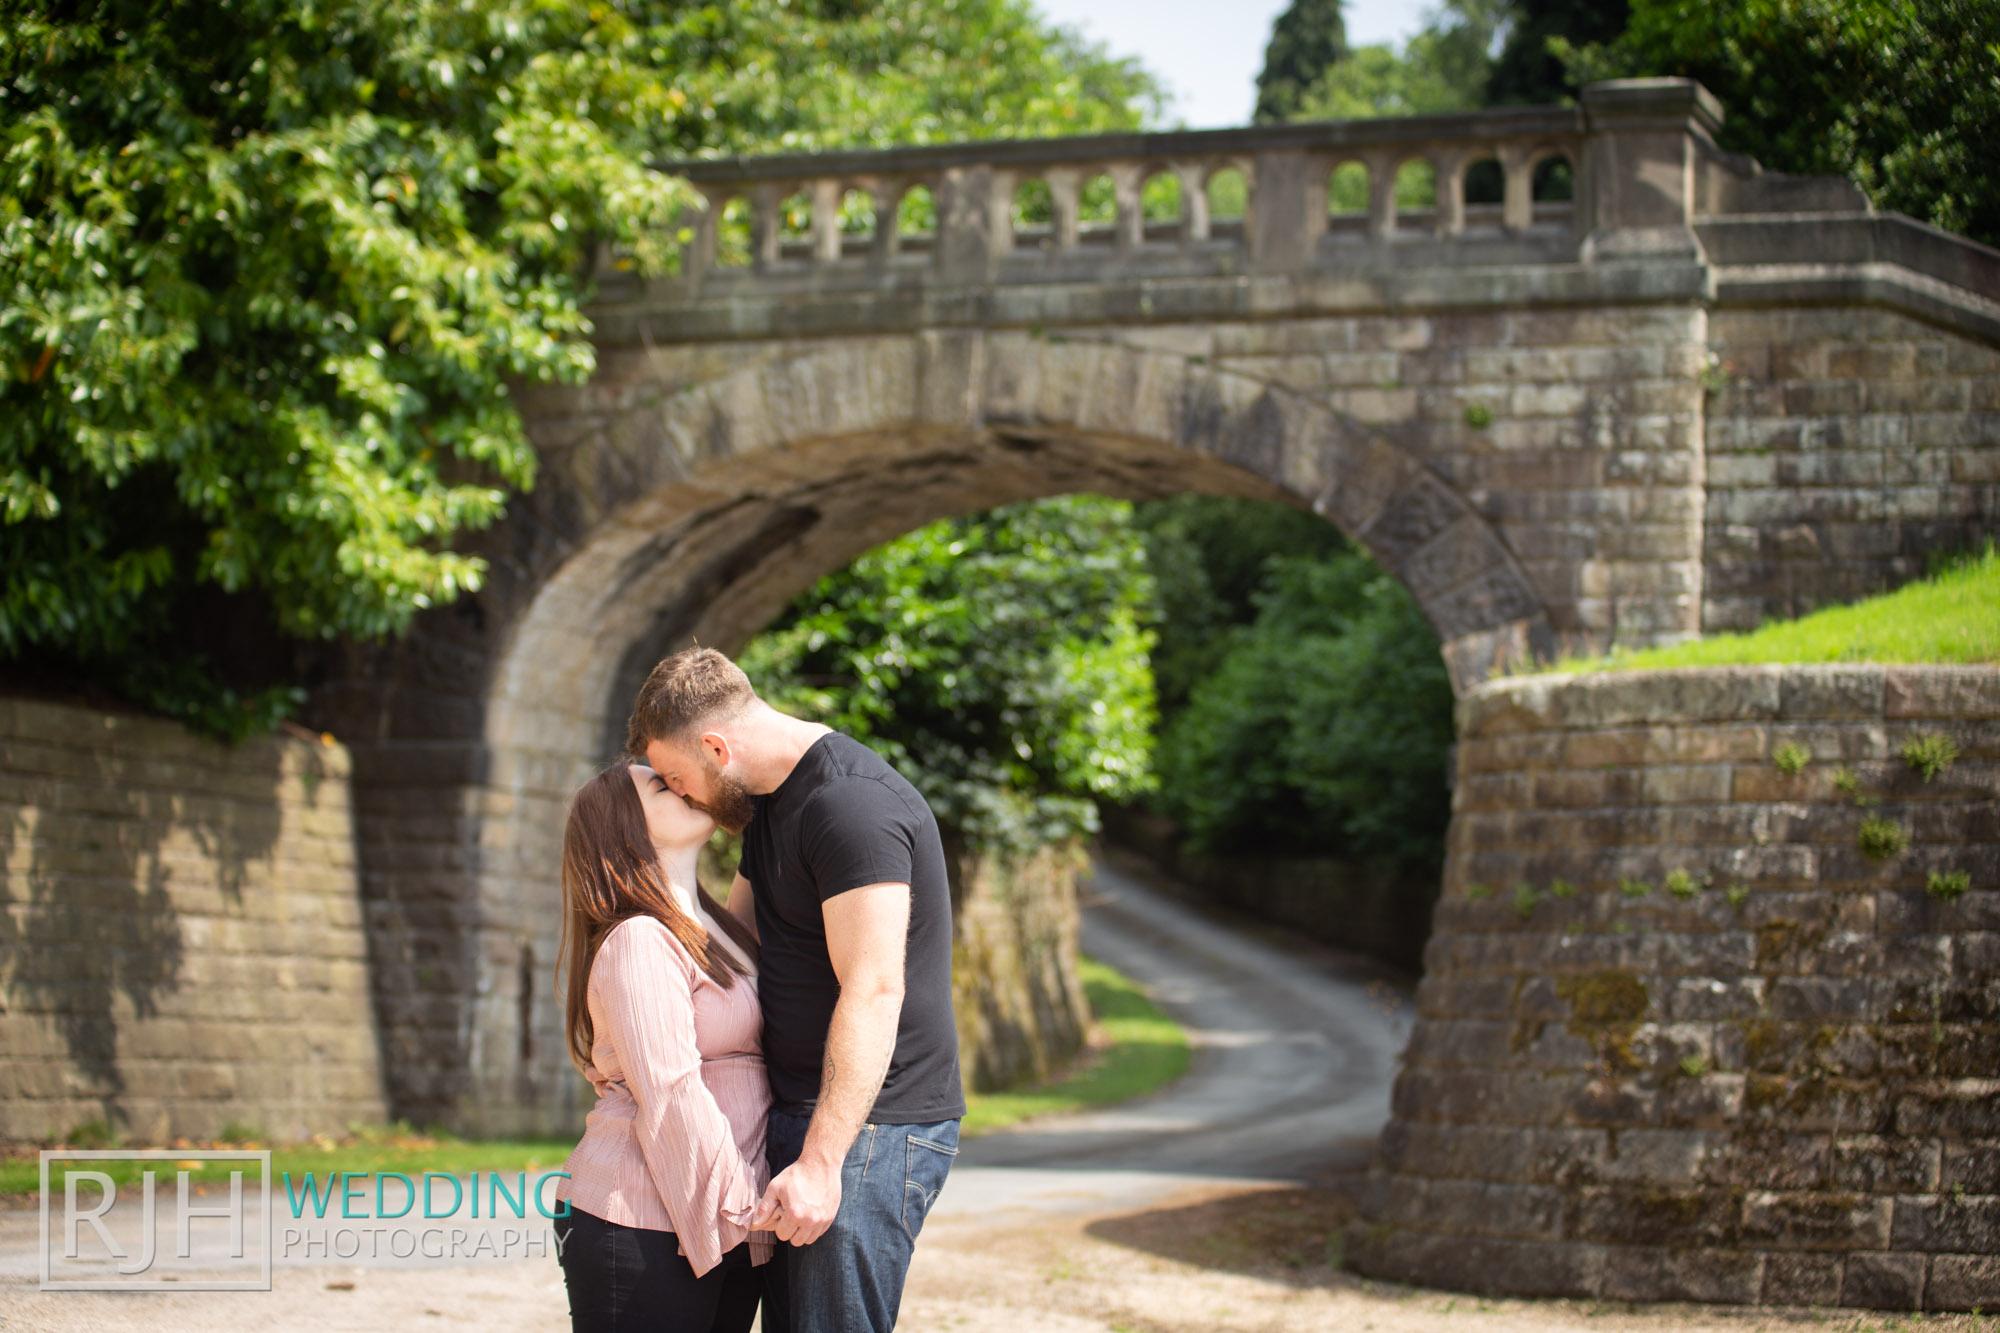 Osmaston Park Wedding Photographer - Jodie & Oli_044_IMG_7636.jpg